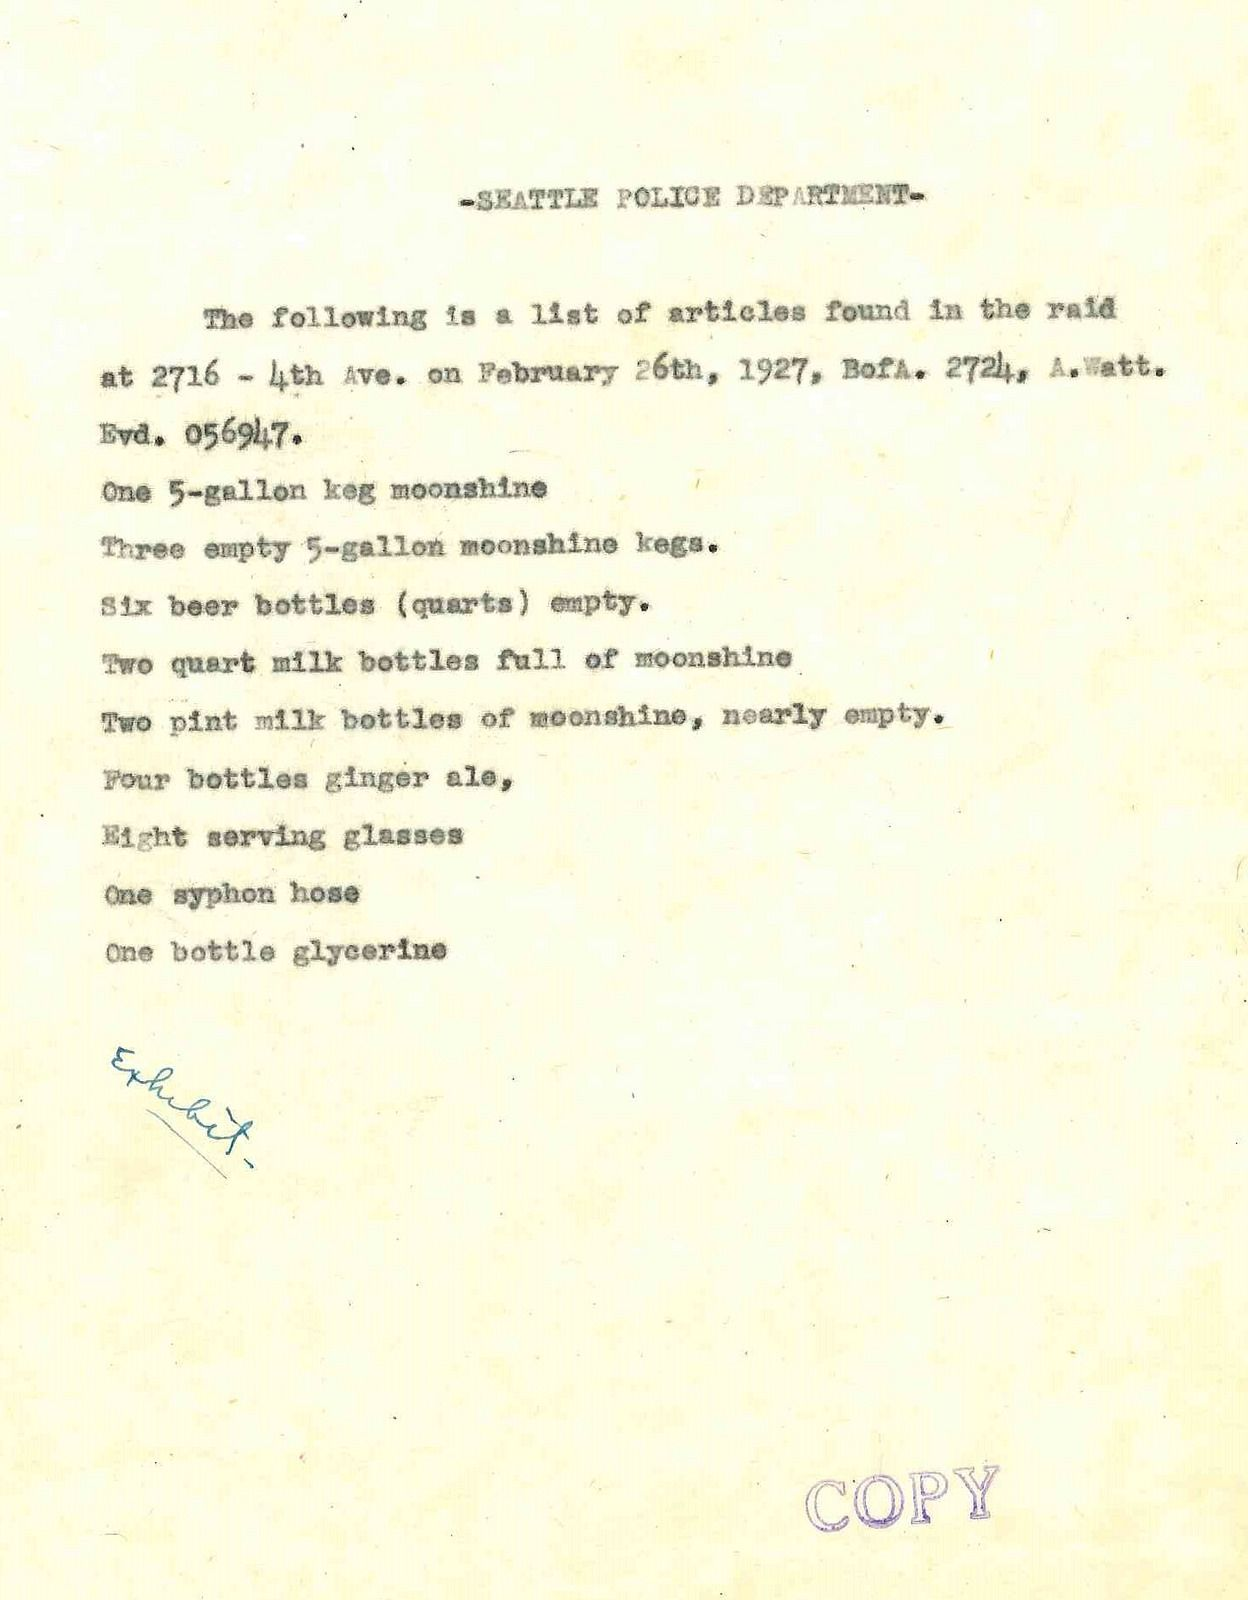 Inventory From Prohibition Raid 1927 Prohibition Raid Milk Bottle